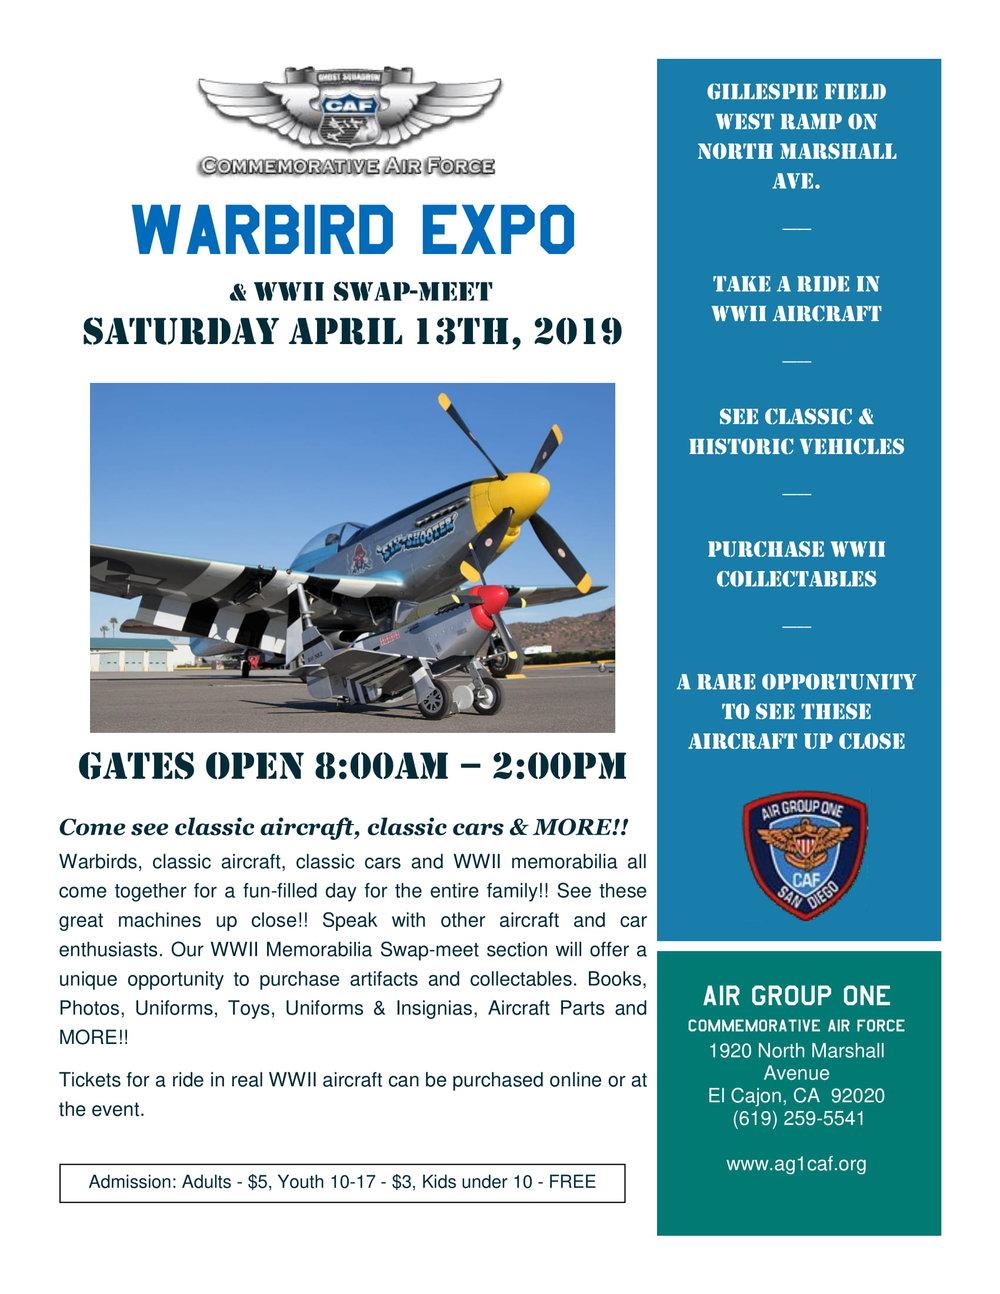 WB Expo 2019 Flyer 1-1.jpg